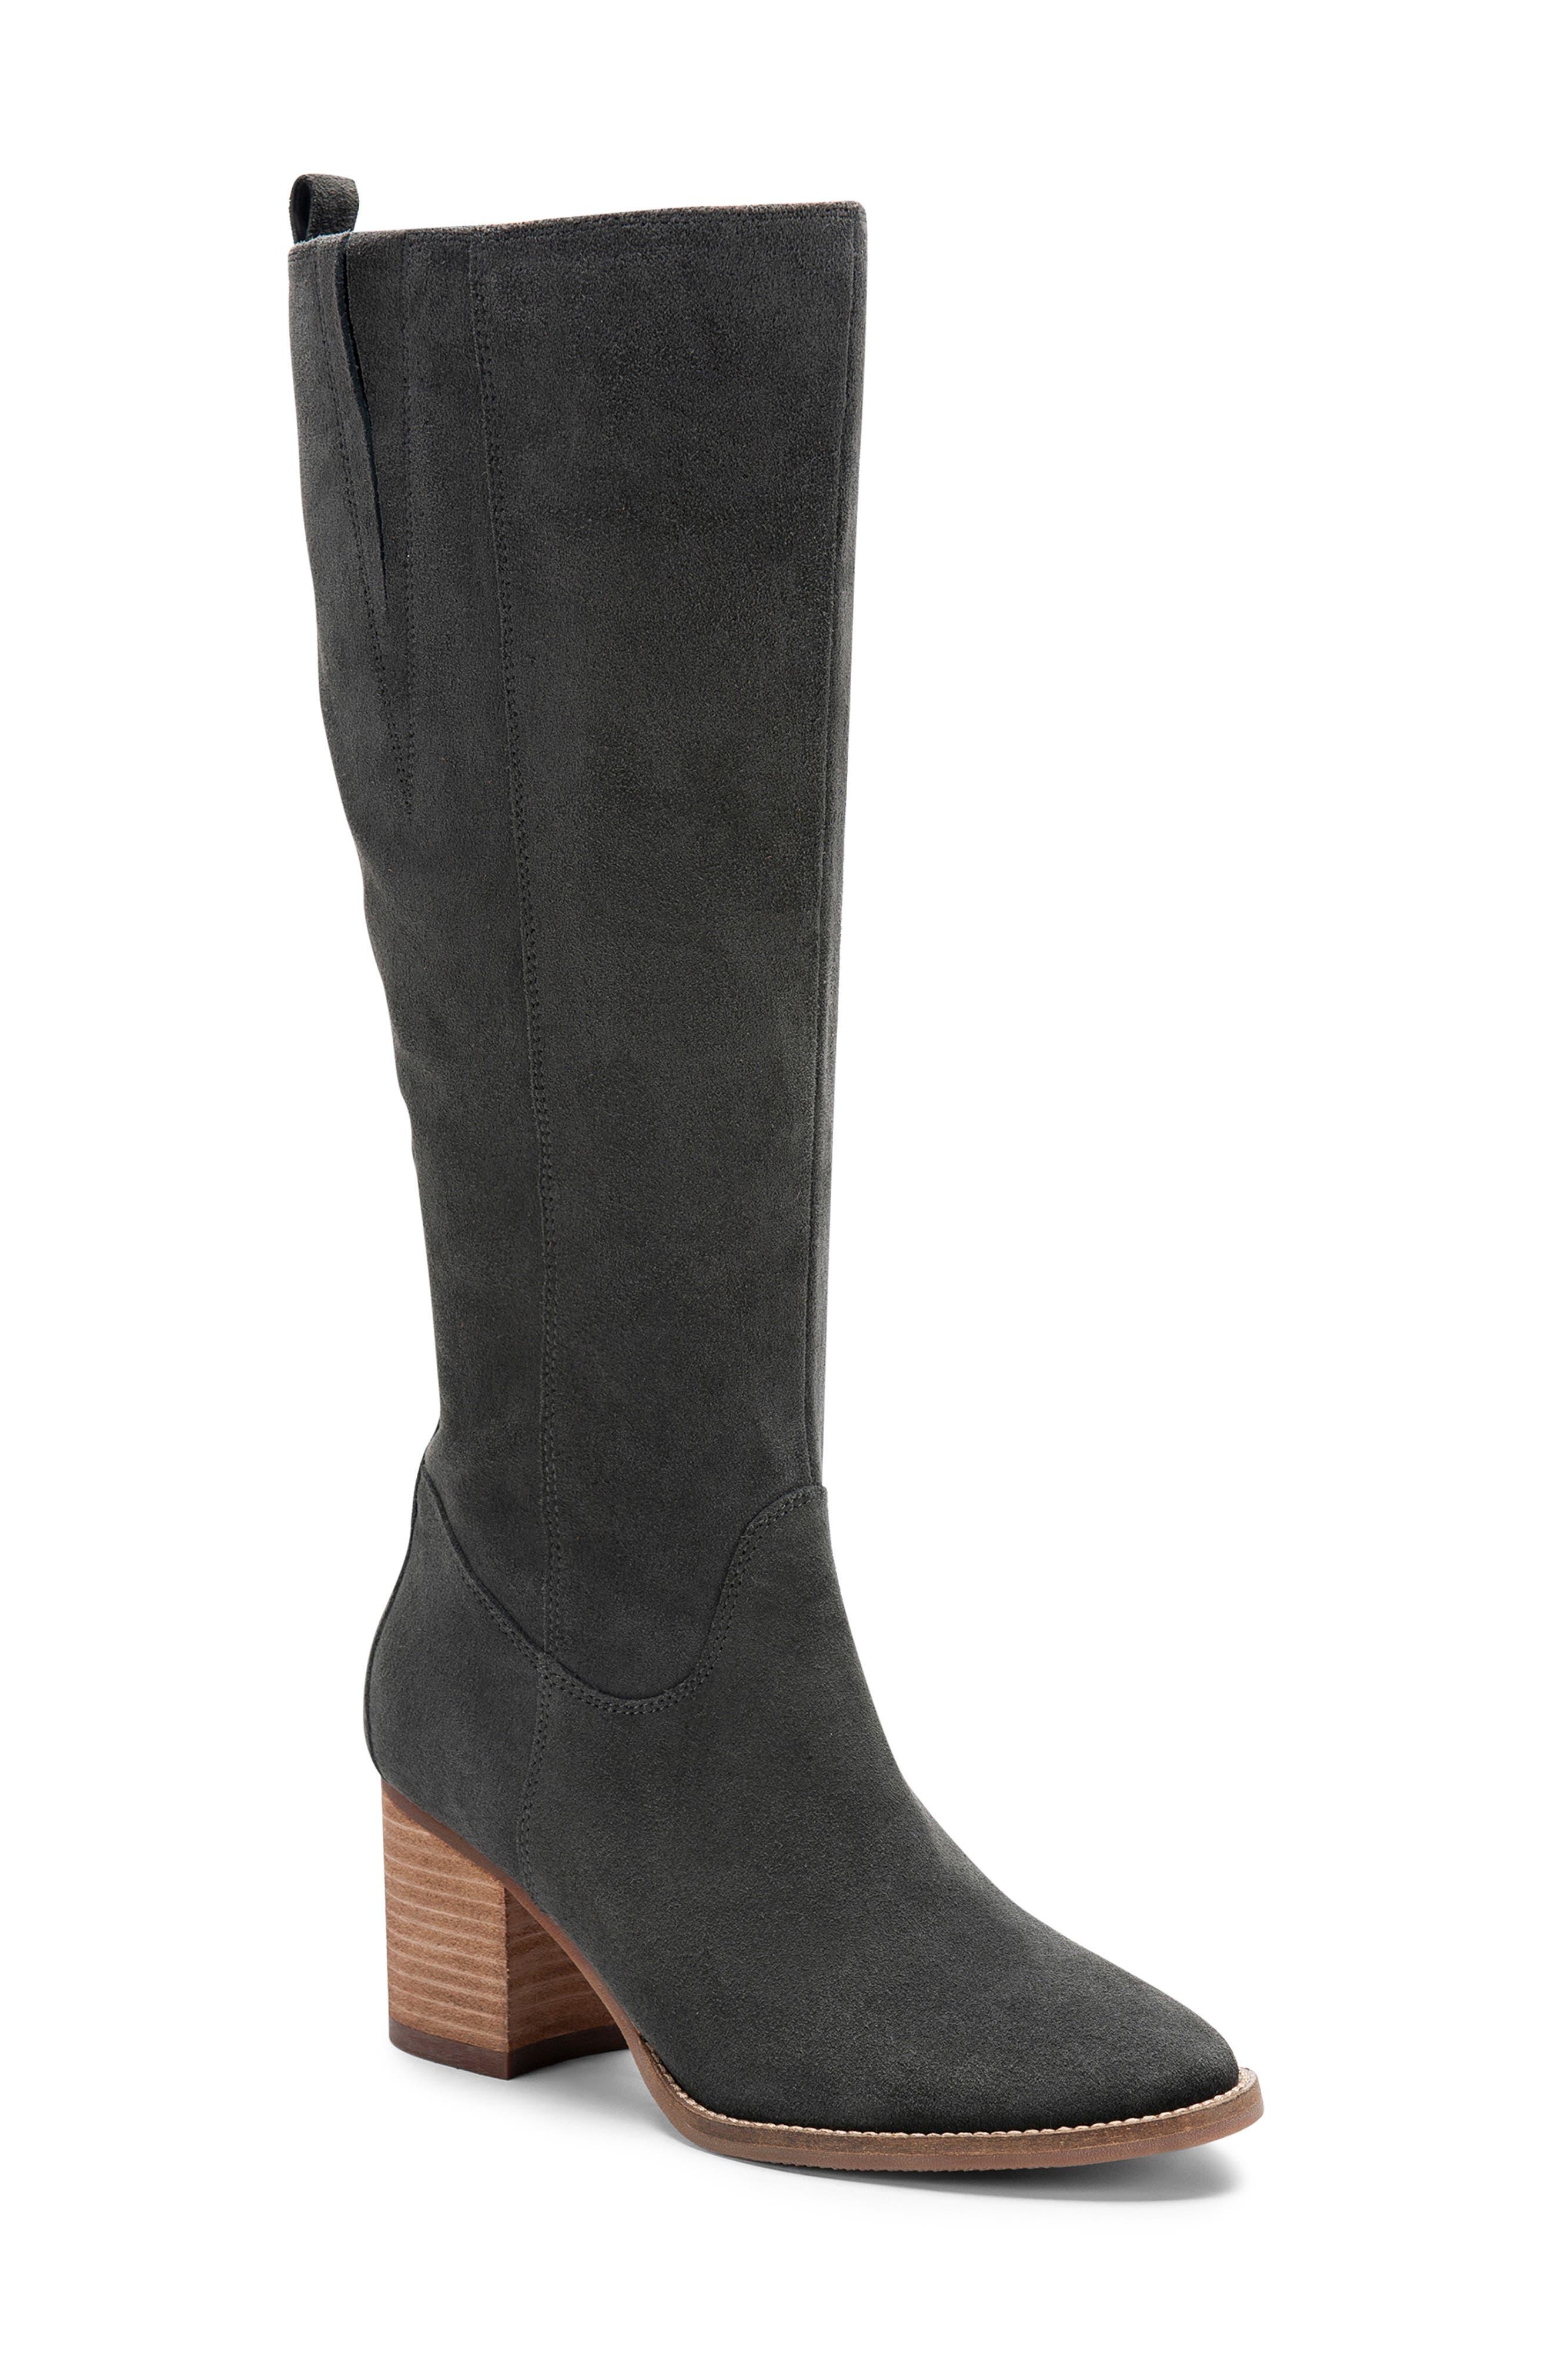 BLONDO Nikki Waterproof Knee High Waterproof Boot, Main, color, DARK GREY SUEDE